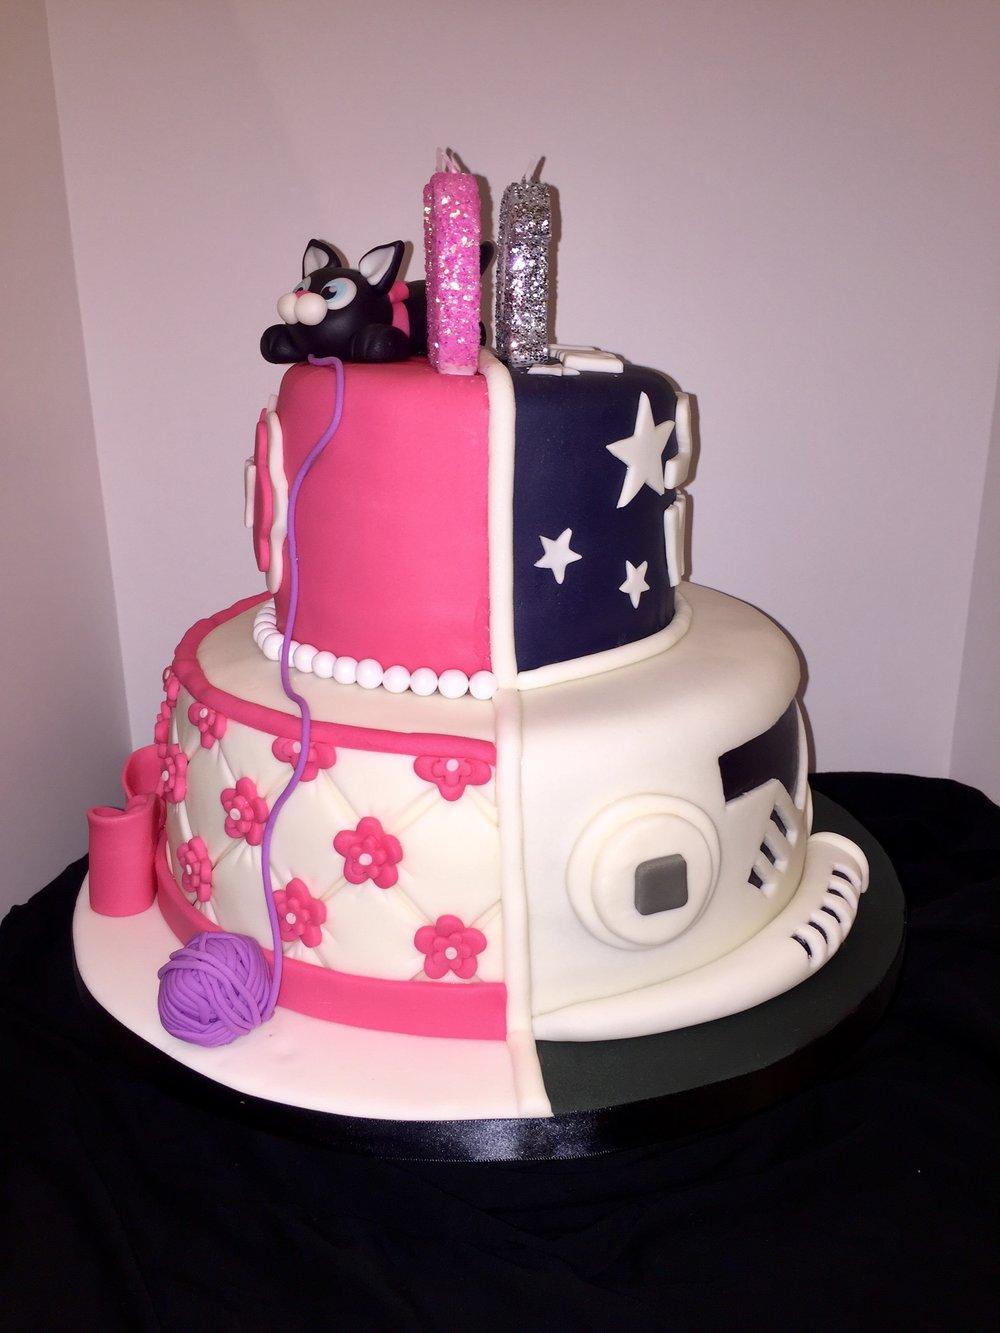 Twin Cake The Cake Fairy